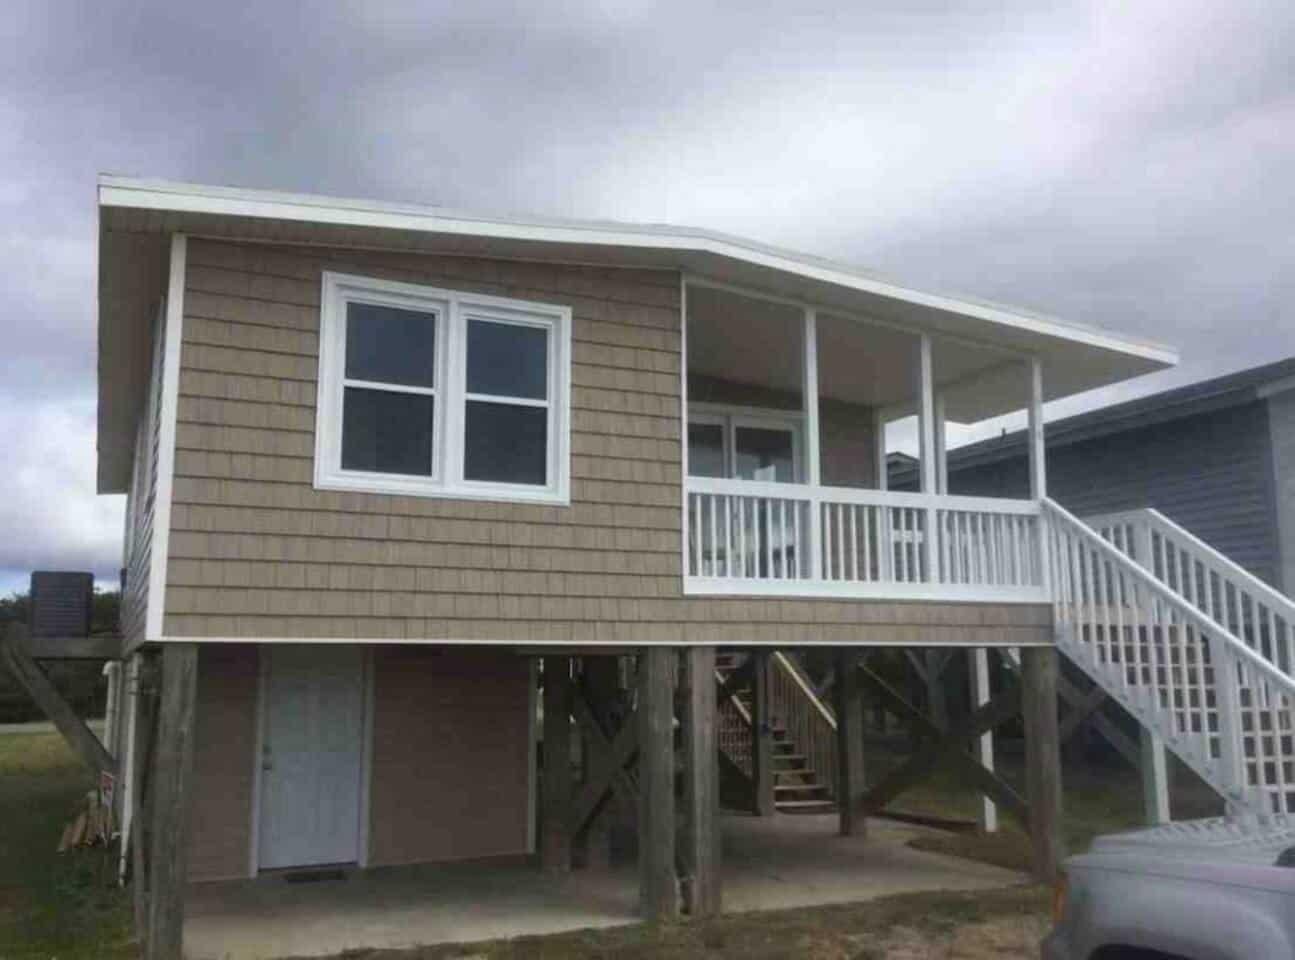 Image of Airbnb rental in Wilmington, North Carolina